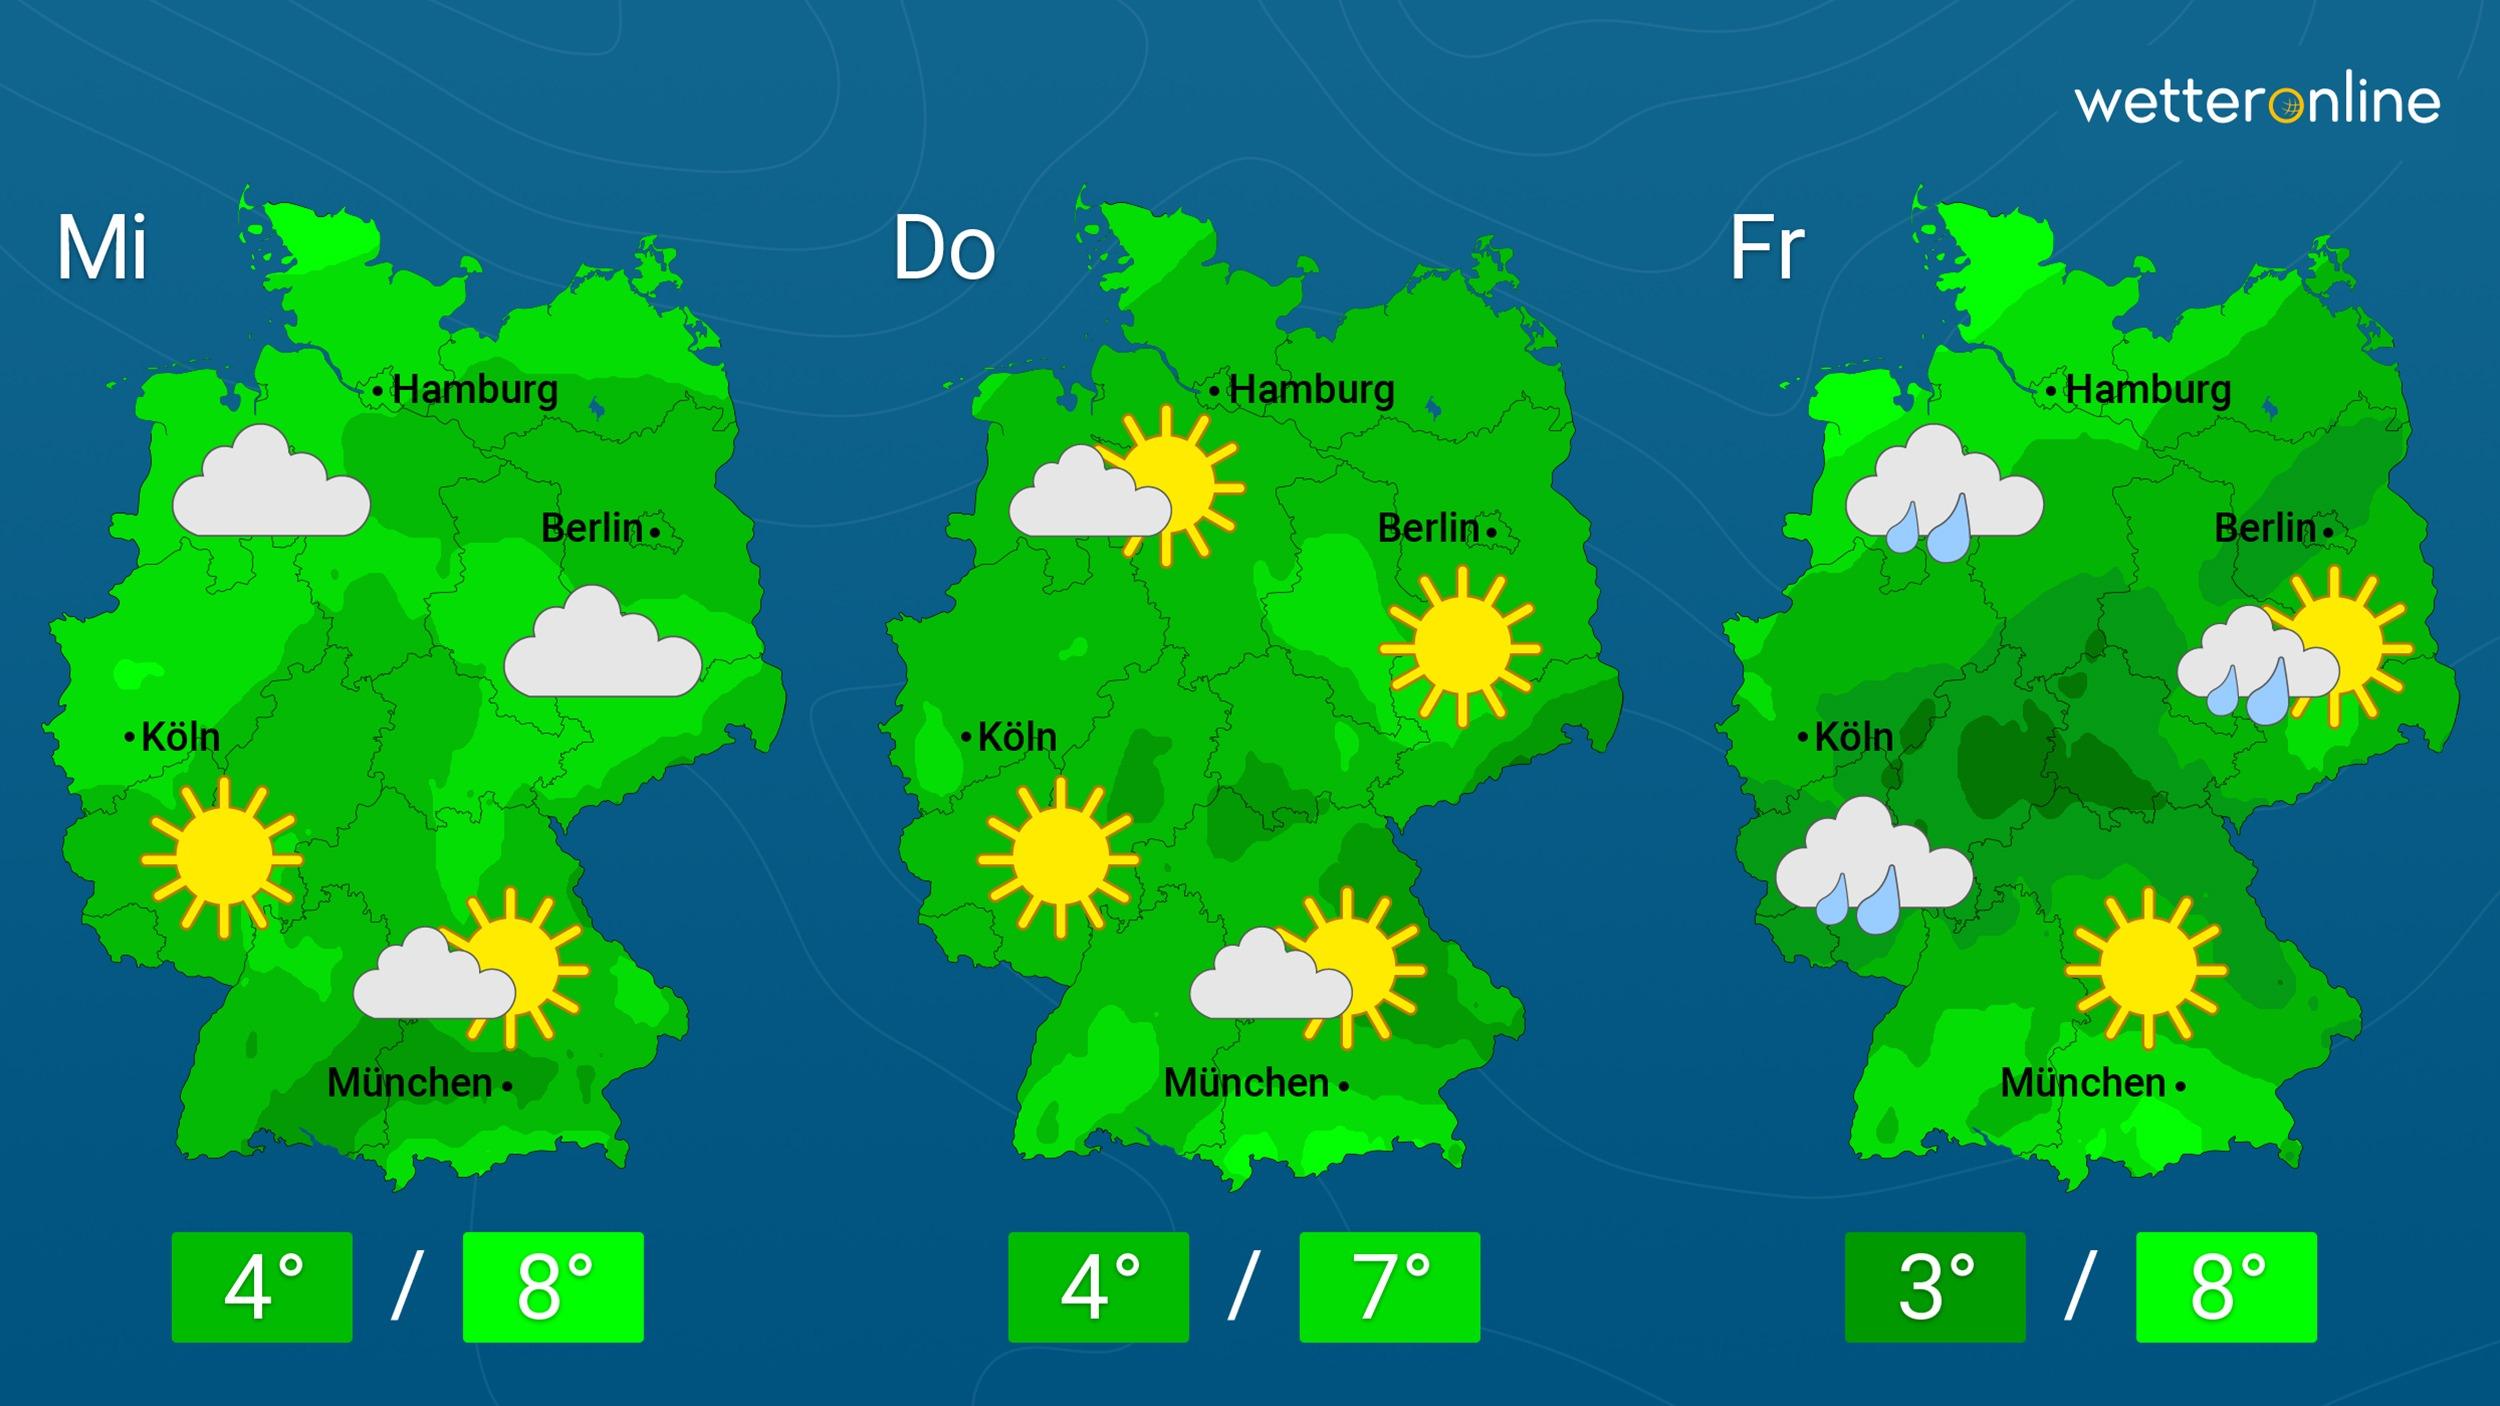 wetterbericht_wetter_wetteronline_bericht_temperaturen_karte_wetterkarte